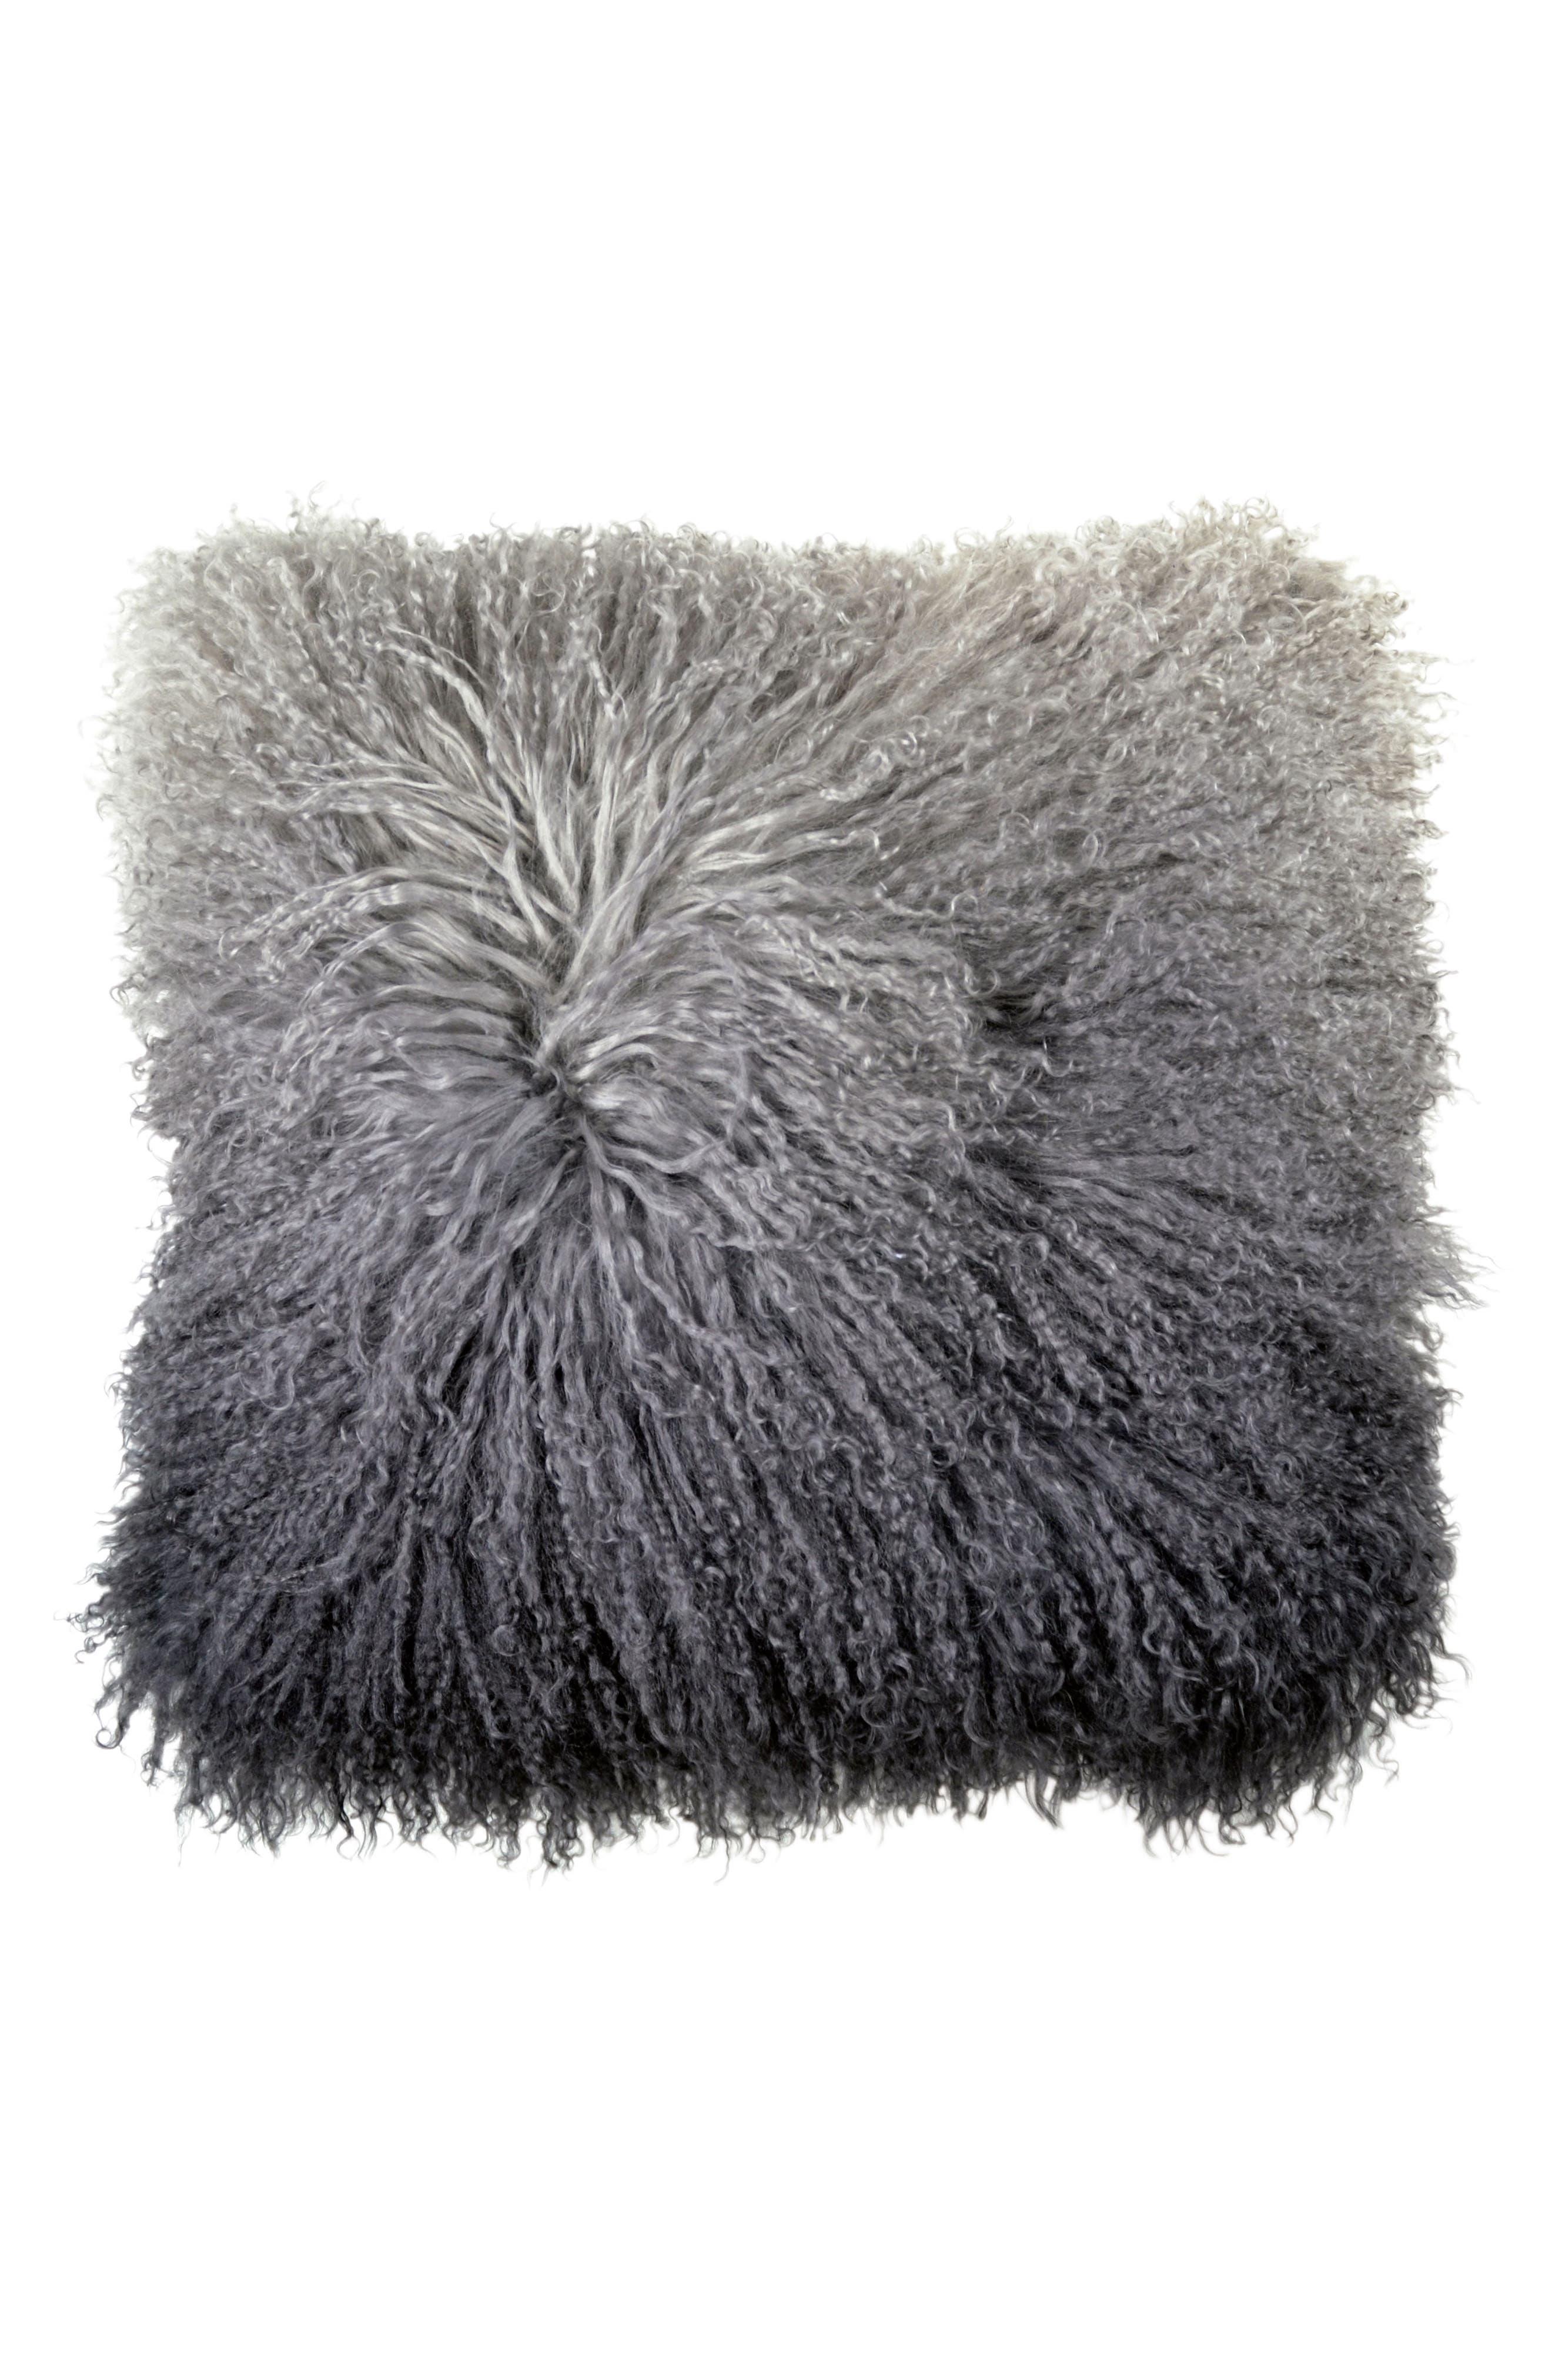 Main Image - Michael Aram Dip Dye Sheepskin Accent Pillow